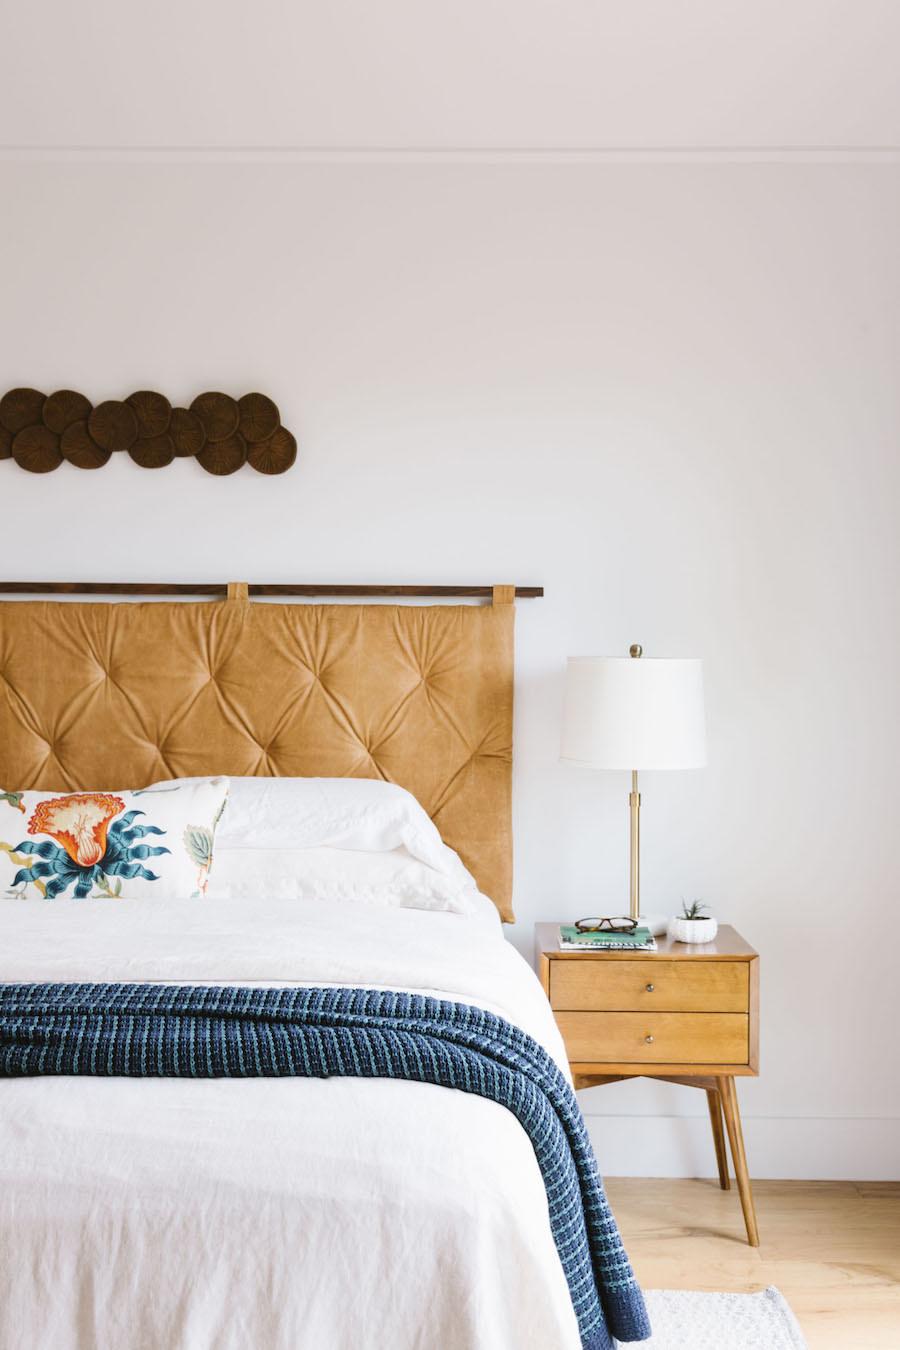 Tan Leather Tufted Headboard Bedroom